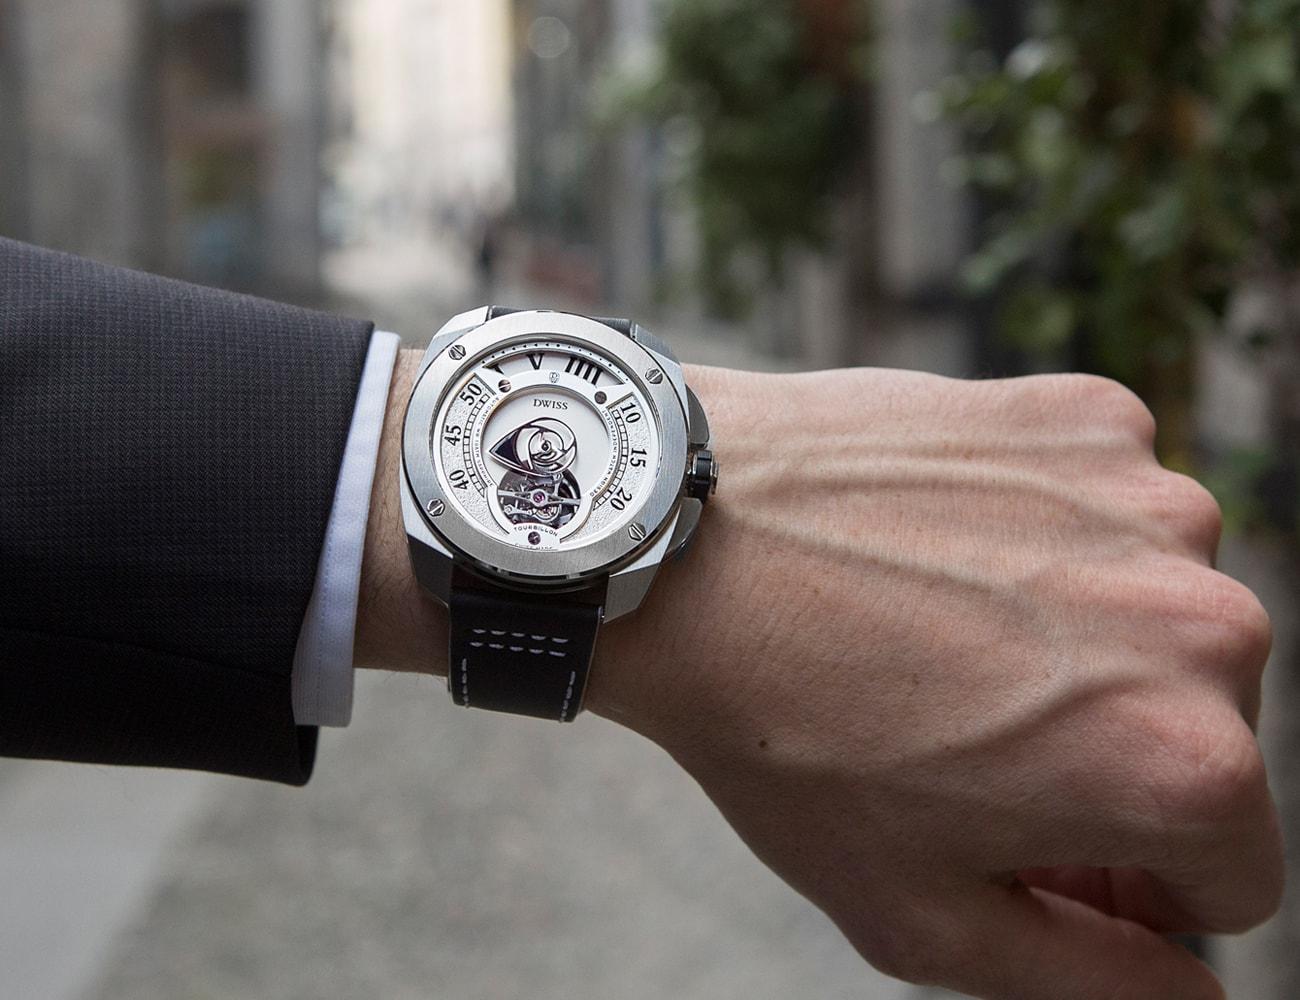 DWISS R1 Swiss Made Watch Collection